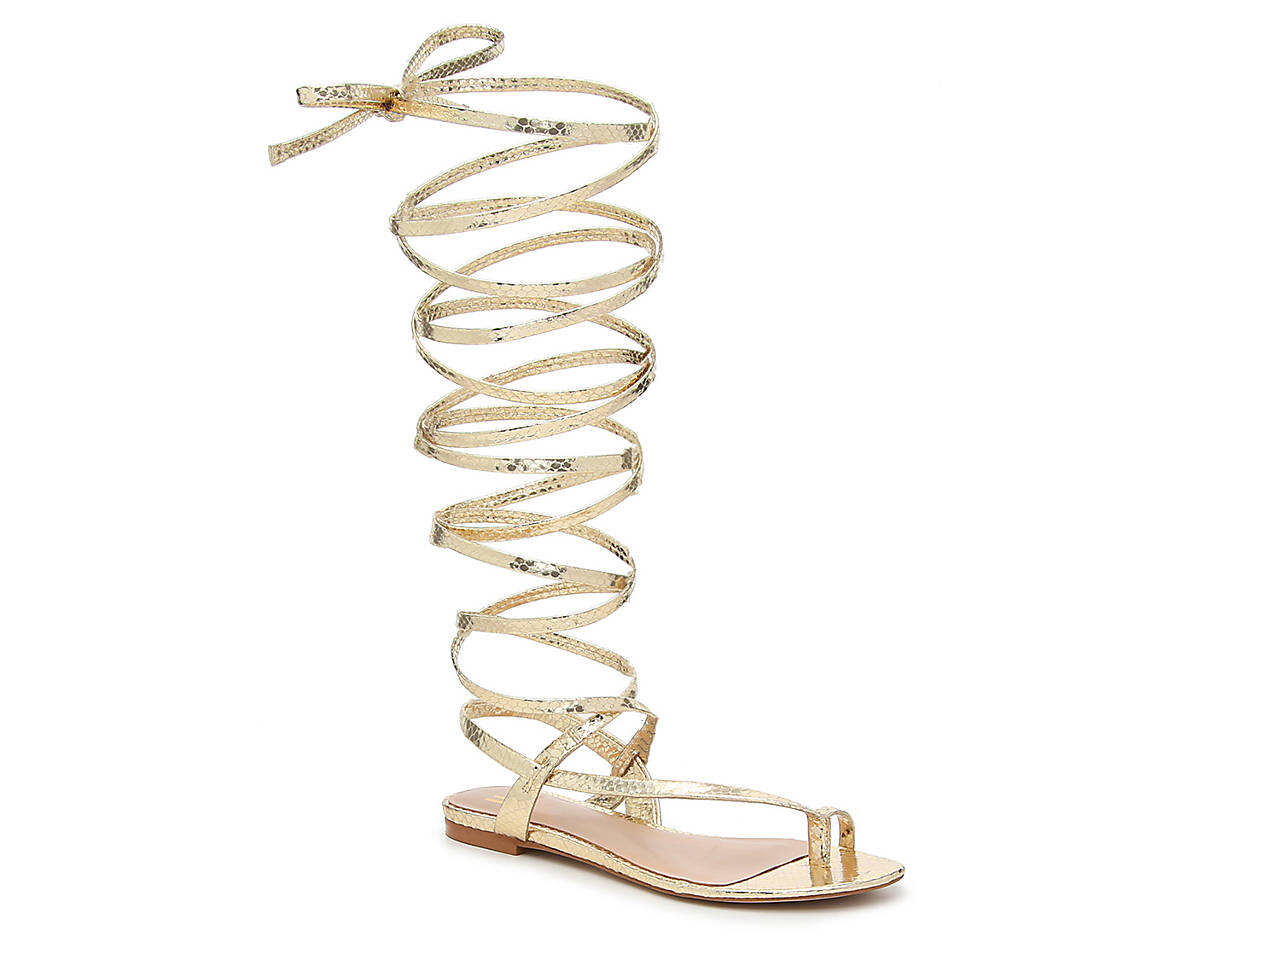 Zapatos, JLo, jennifer Lopez, coleccion, DSW